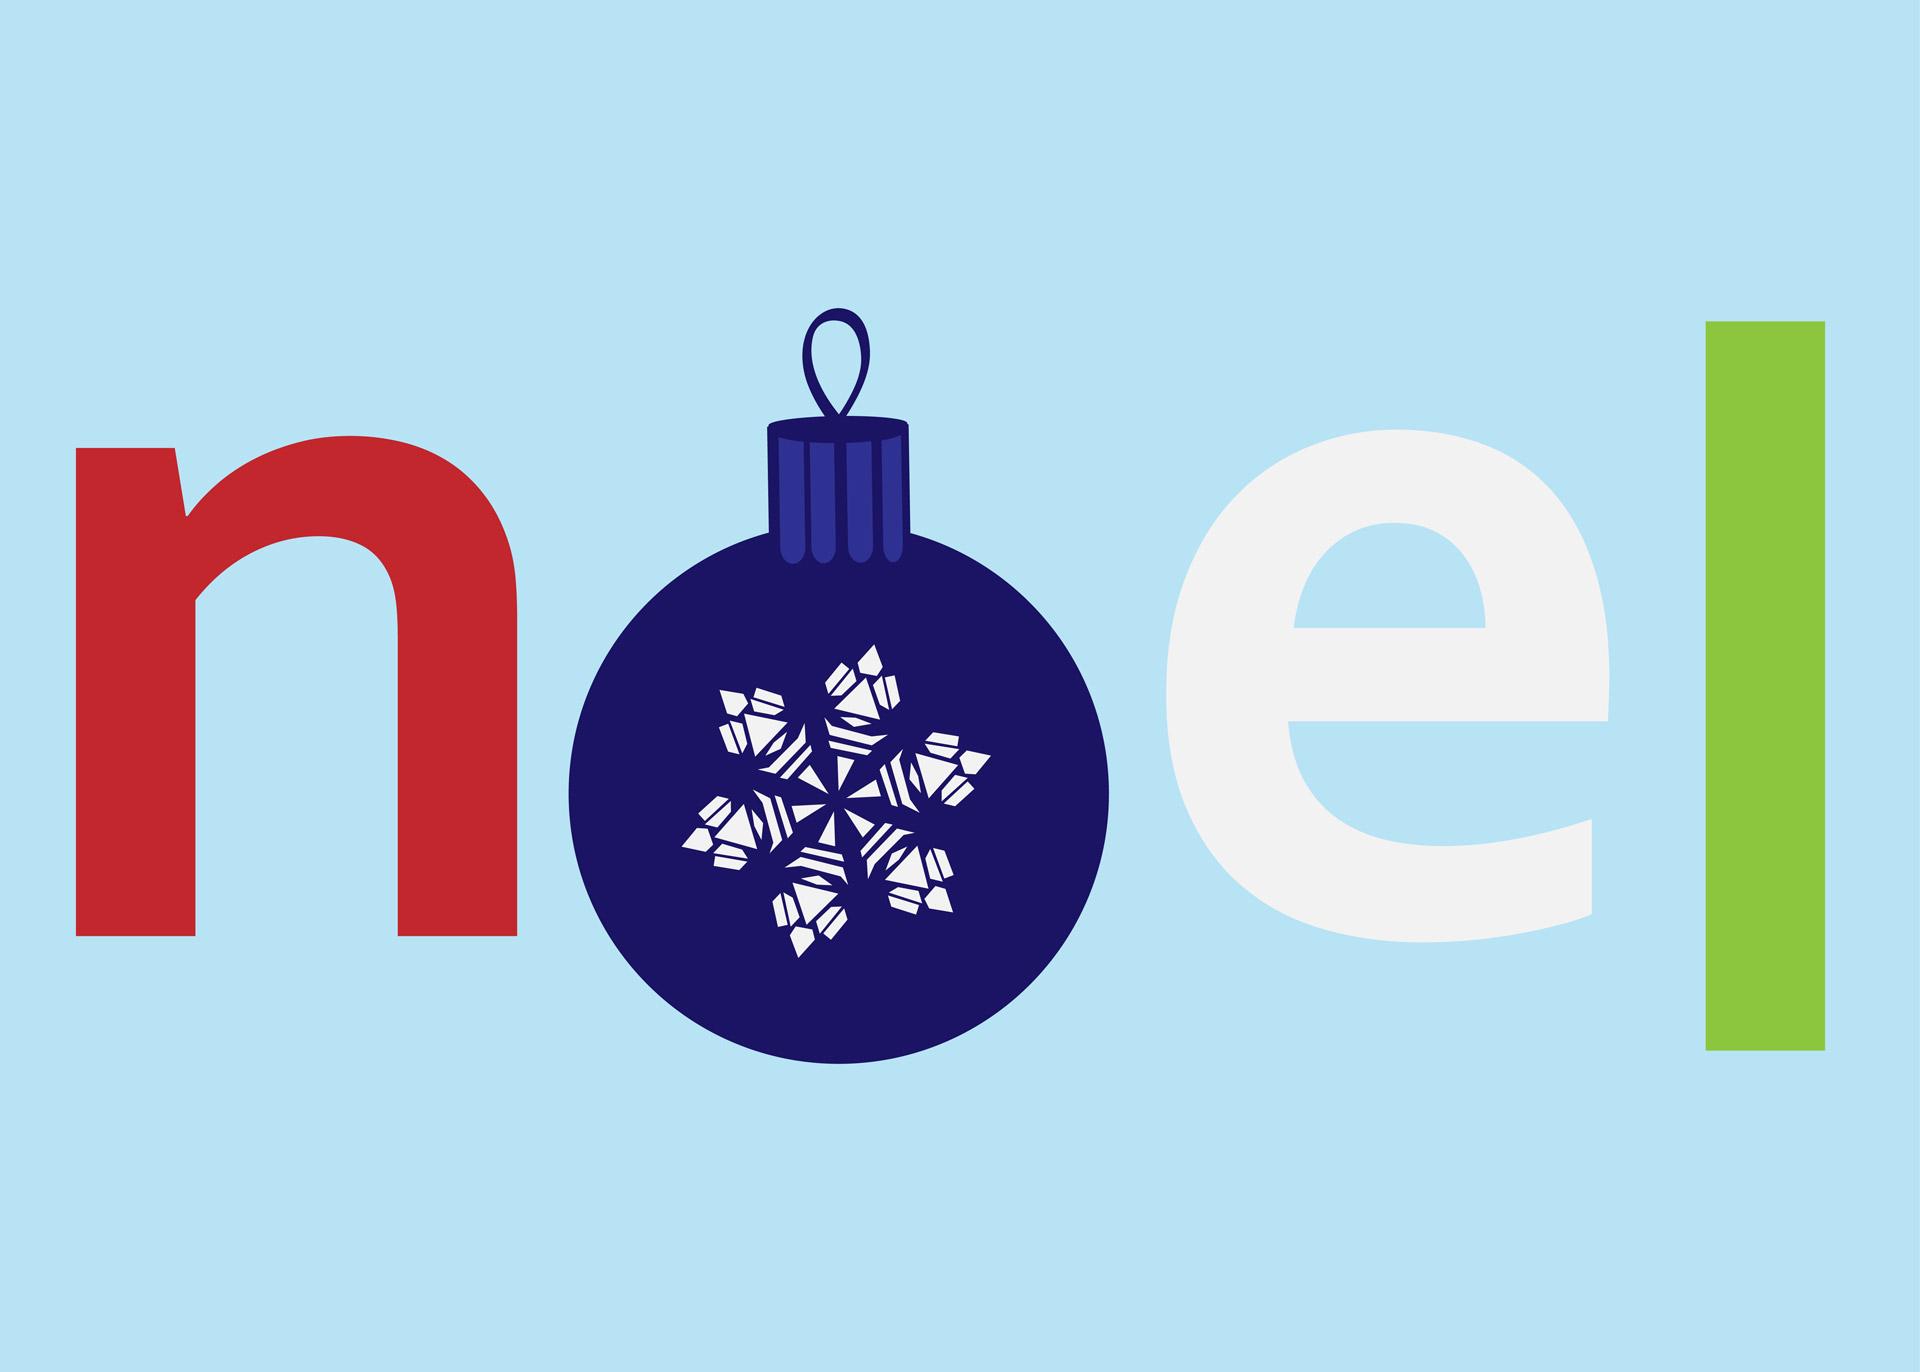 Noel Text Clipart Free Stock Photo.